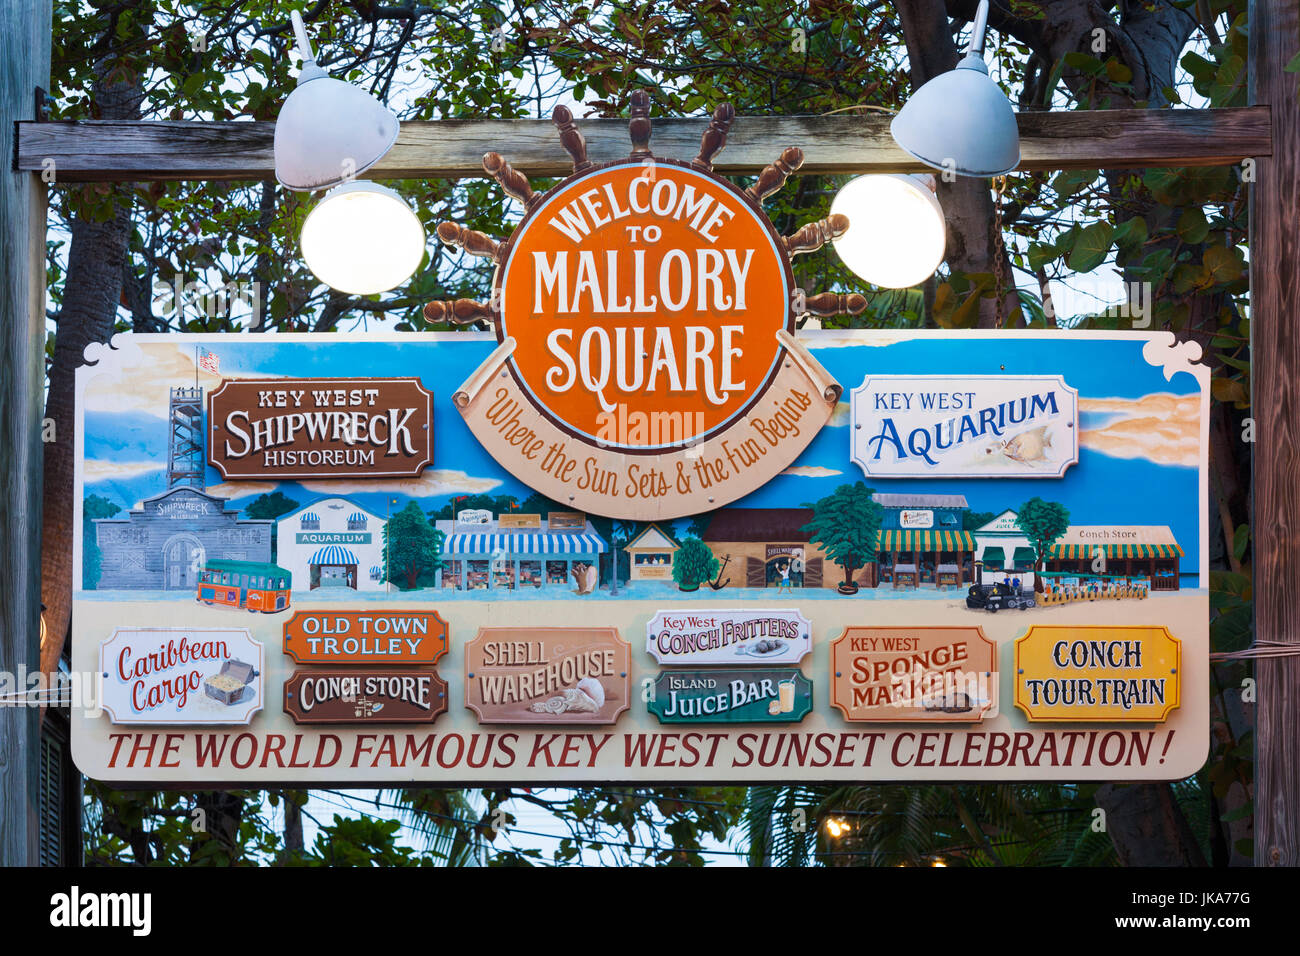 USA, Florida, Florida Keys, Key West, Mallory Square sign - Stock Image